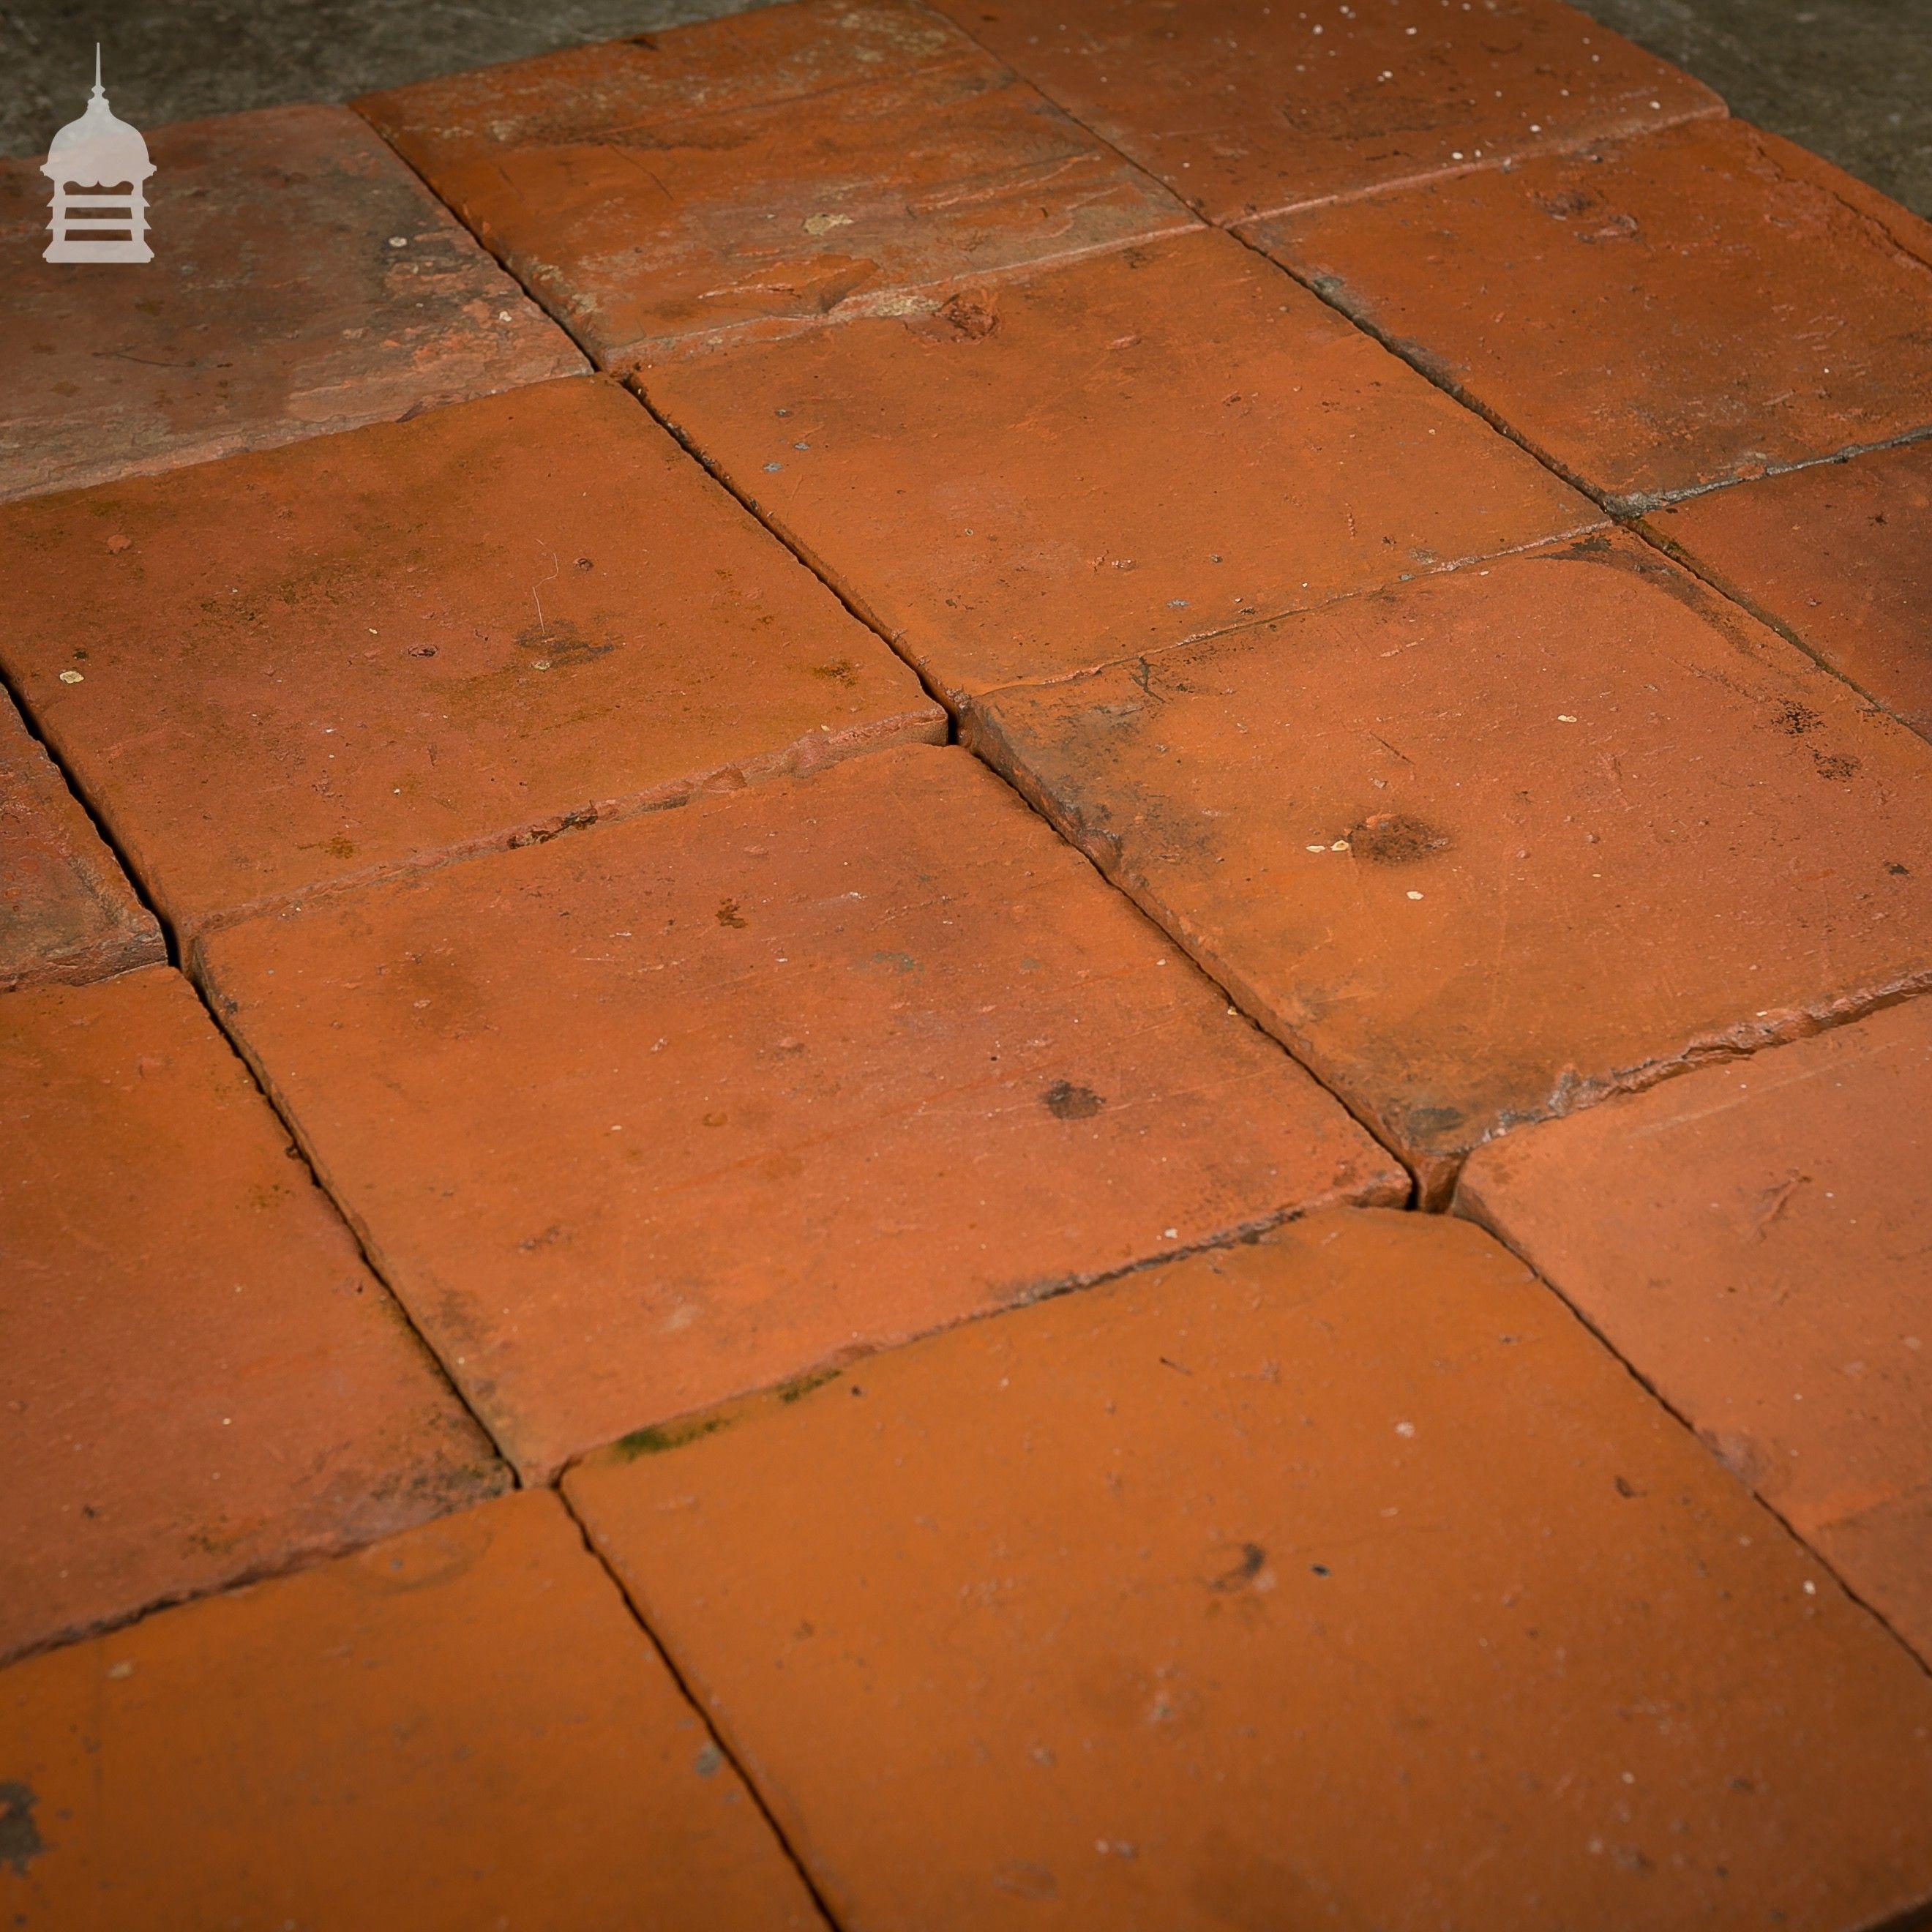 Wonderful 12X12 Black Ceramic Tile Huge 12X24 Tile Floor Square 150X150 Floor Tiles 18 Ceramic Tile Youthful 24 X 24 Ceramic Tile Dark24X24 Floor Tile Reclaimed 9 Inch X 9 Inch Red Quarry Tiles 9x9 Floor Tiles   Quarry ..